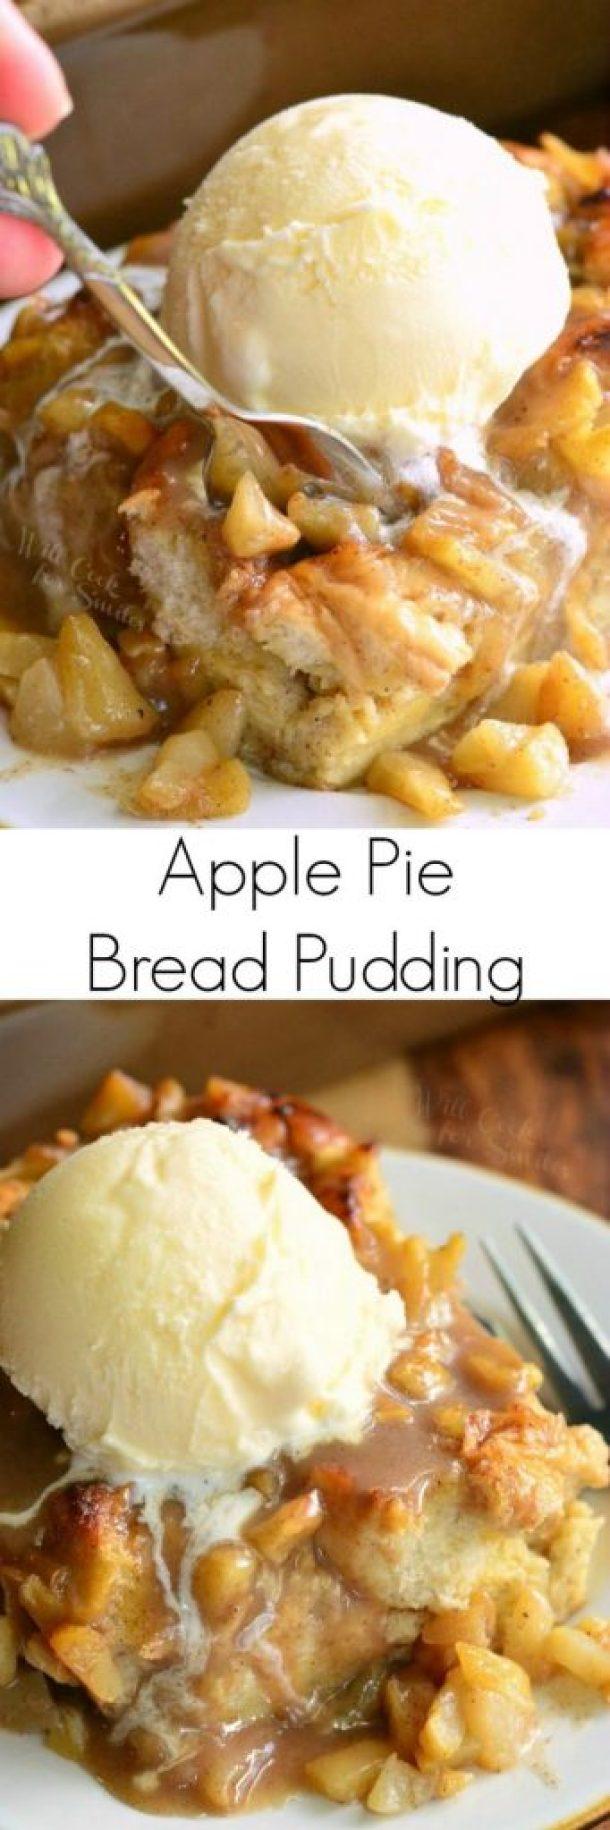 Apple Pie Bread Pudding Dessert Recipe | Will Cook For Smiles - Apple Recipes